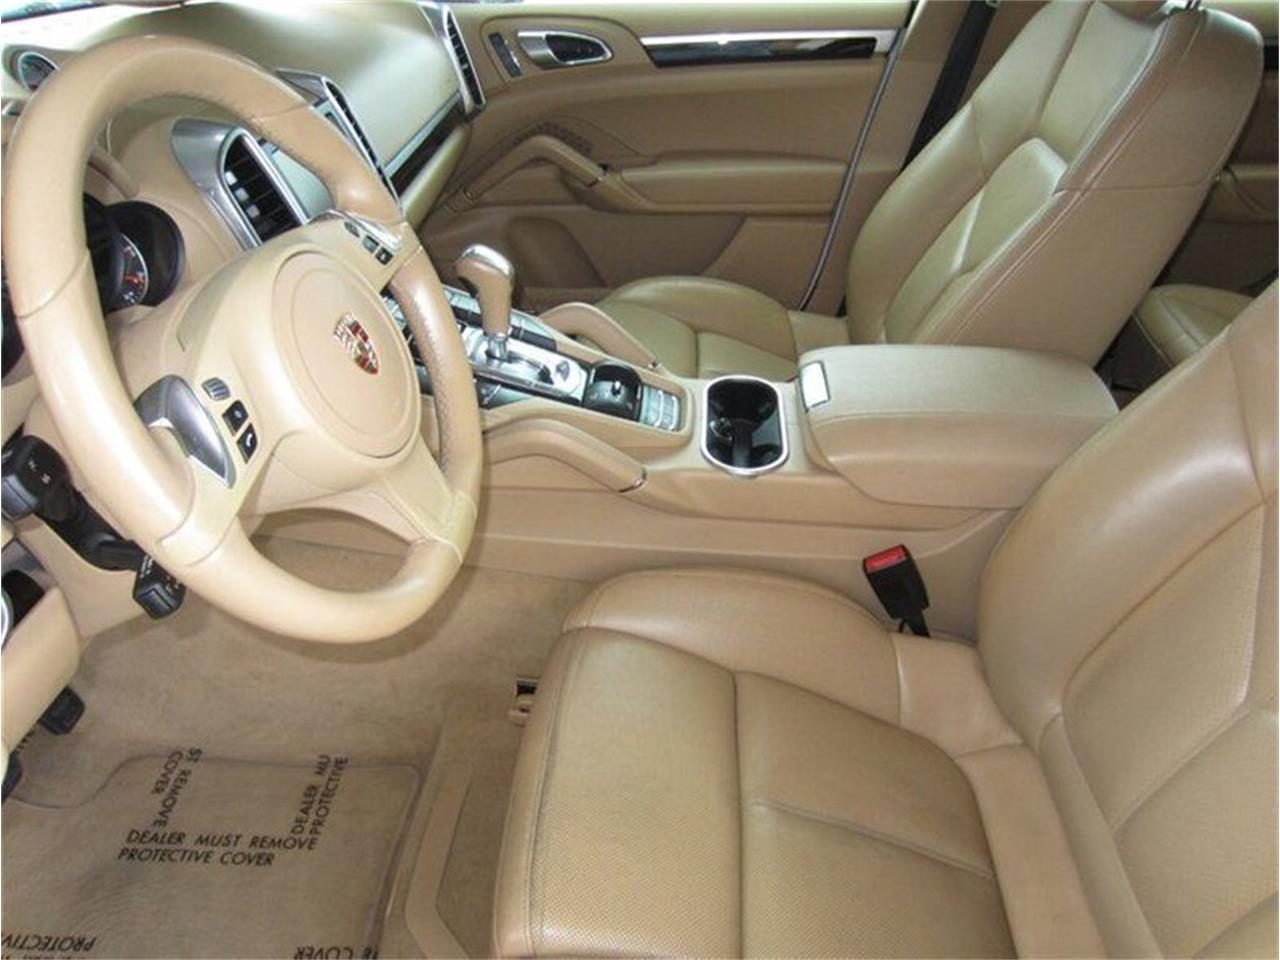 2014 Porsche Cayenne (CC-1421886) for sale in Punta Gorda, Florida